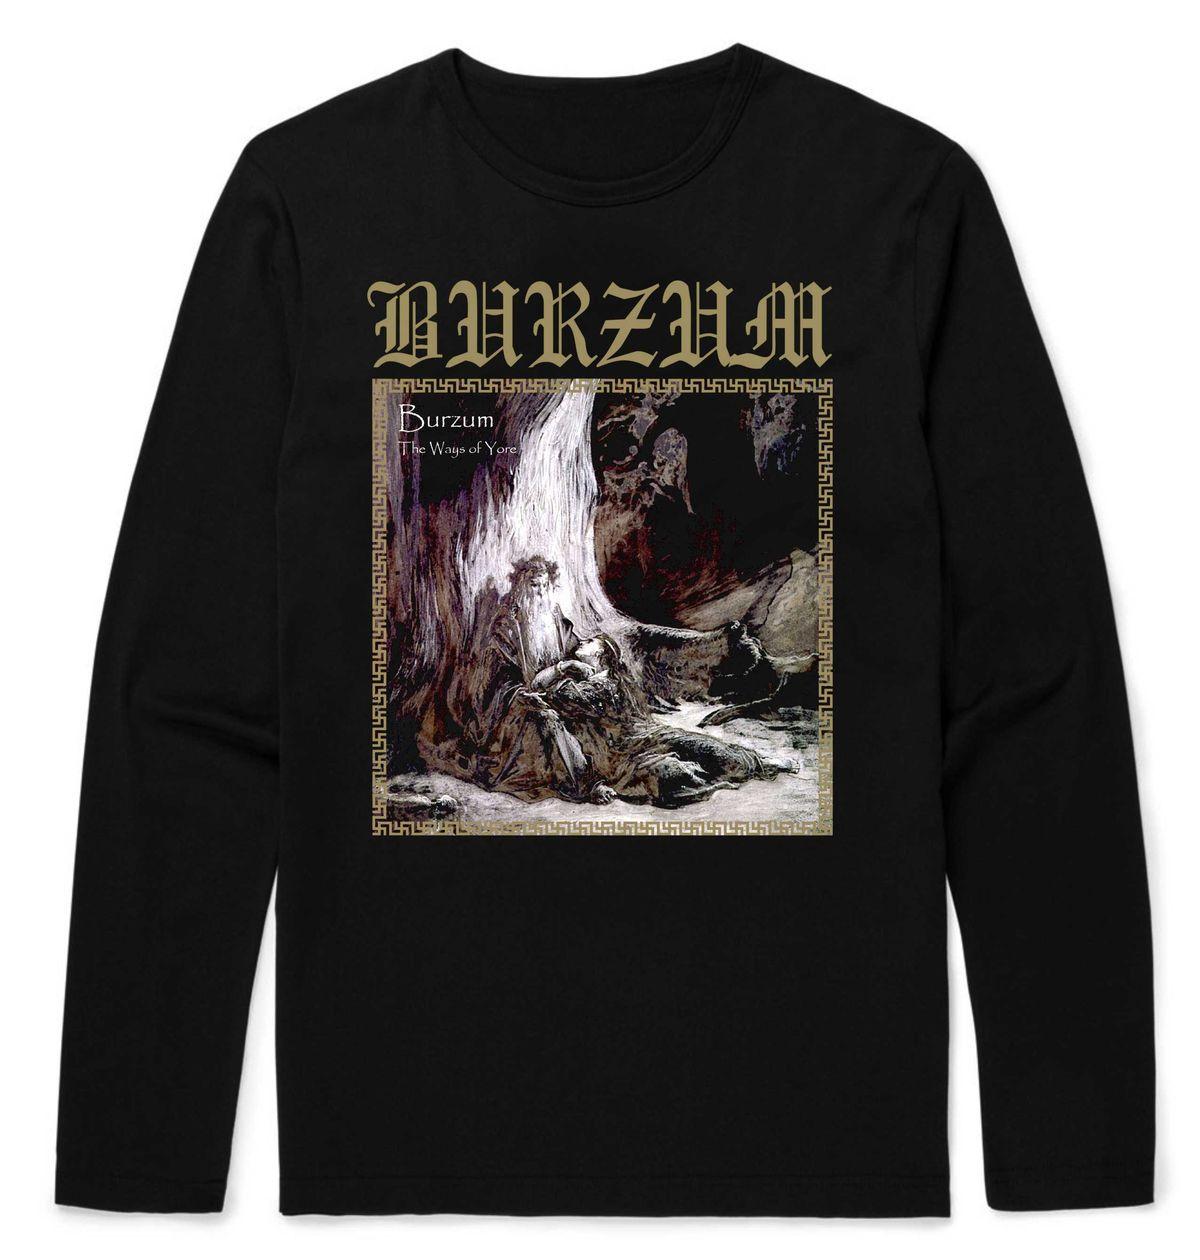 Burzum The Ways Of Yore Longsleeve T-Shirt – Metal & Rock ...